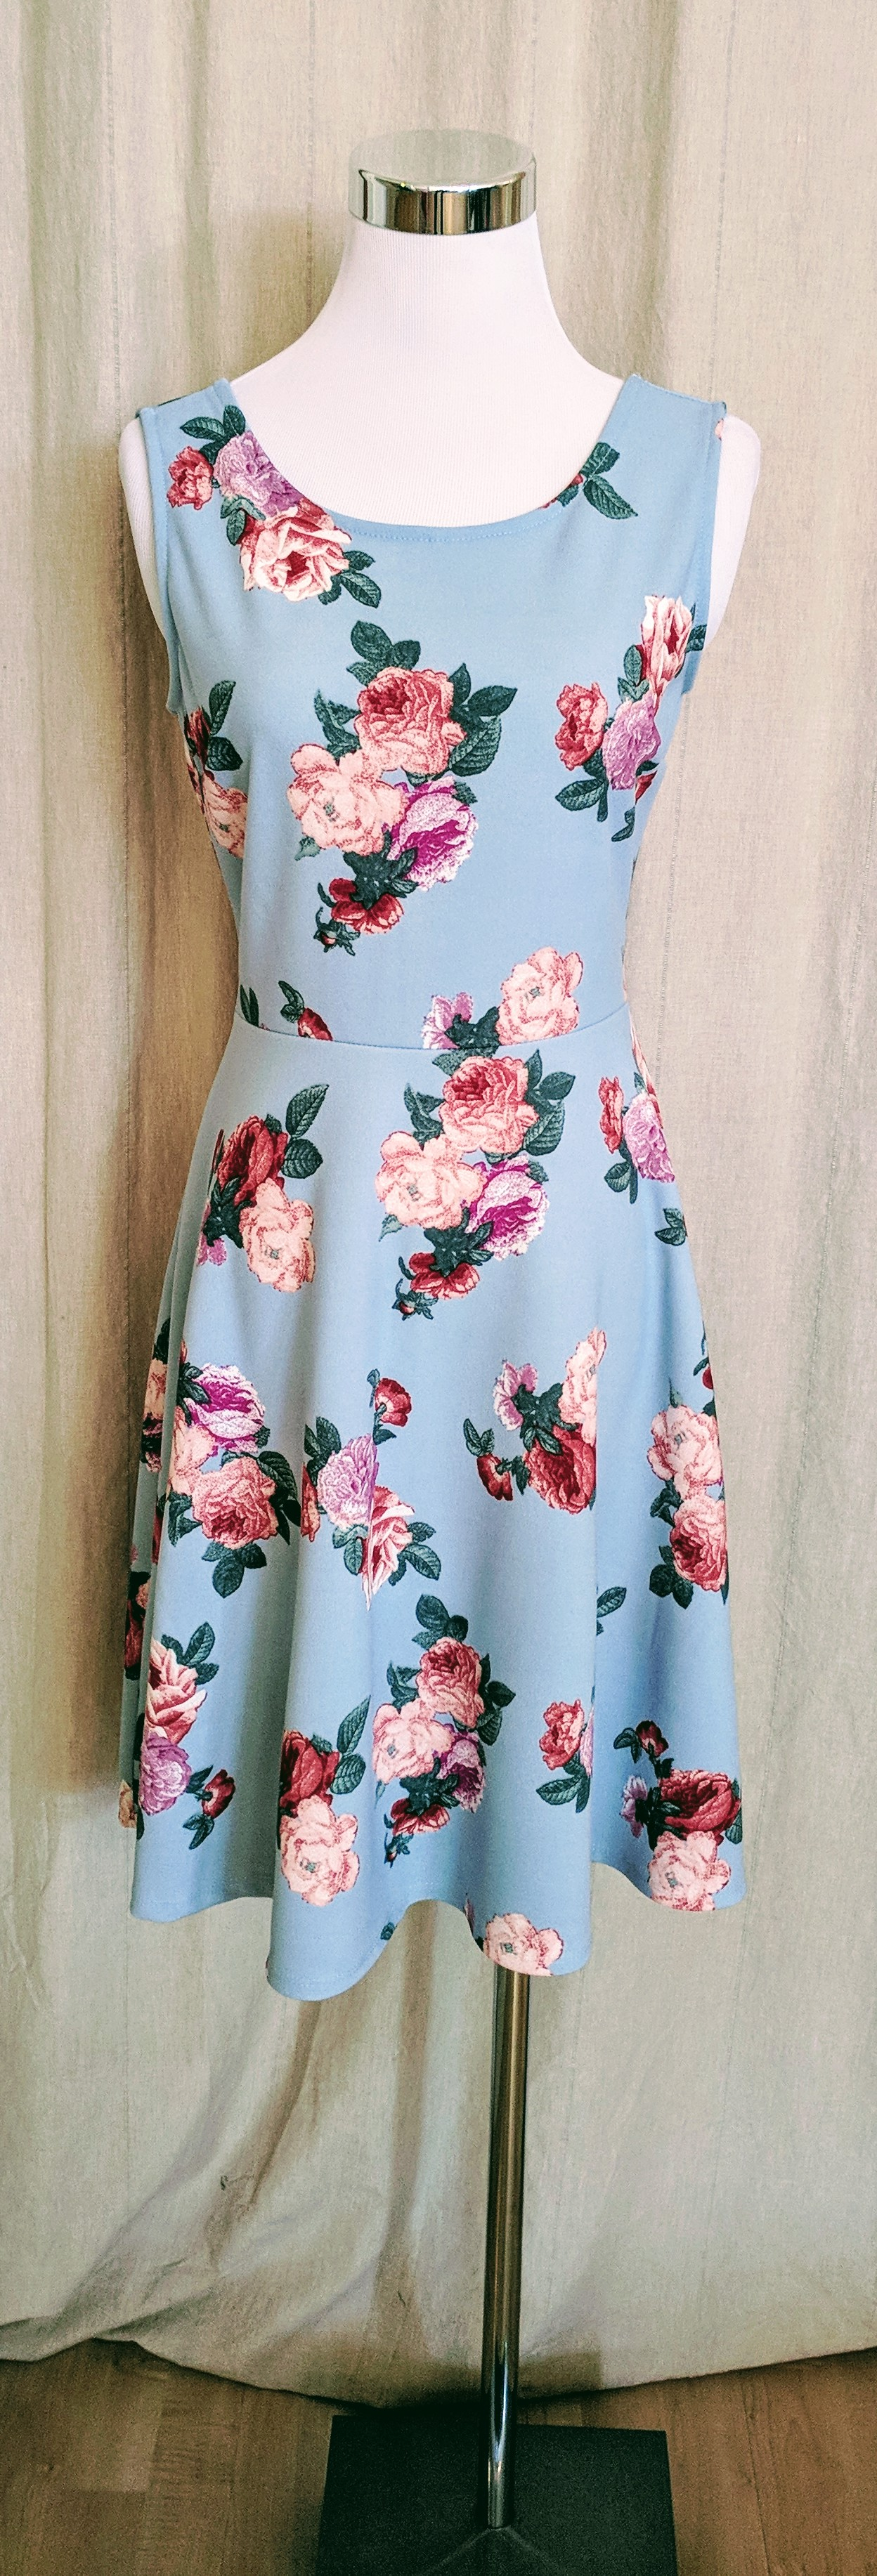 Mint A-line floral tank dress. $38